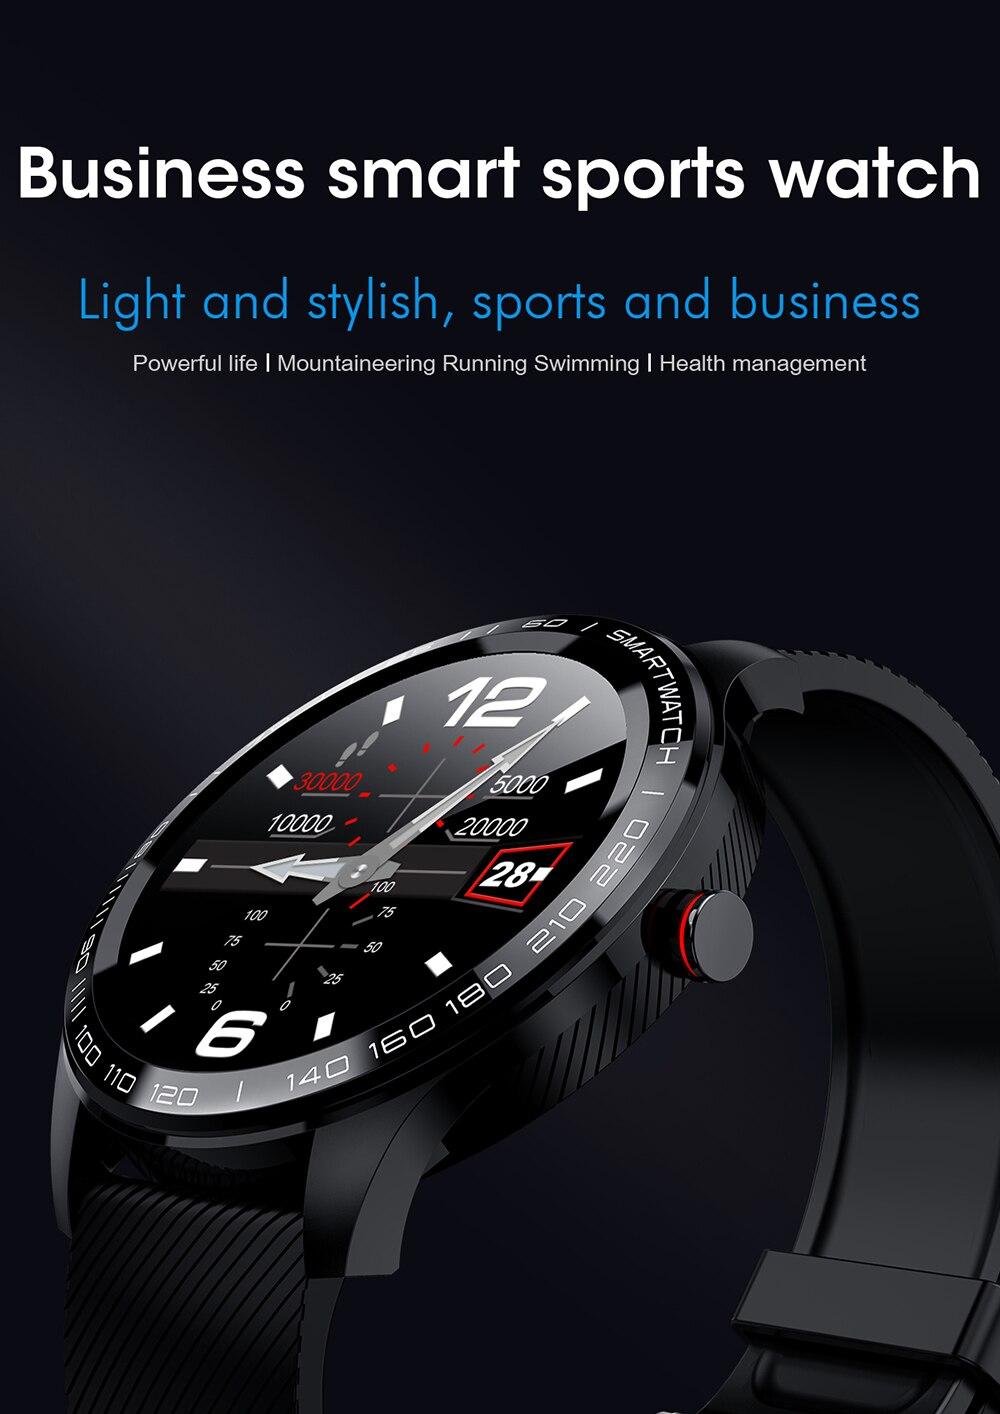 H809ebe1ef7994dffbeb1cb21b62a08bfD 696 L9 Full touch Smart Watch Men ECG+PPG Heart Rate Blood Pressure oxygen Monitor IP68 Waterproof Bluetooth Smart Bracelet